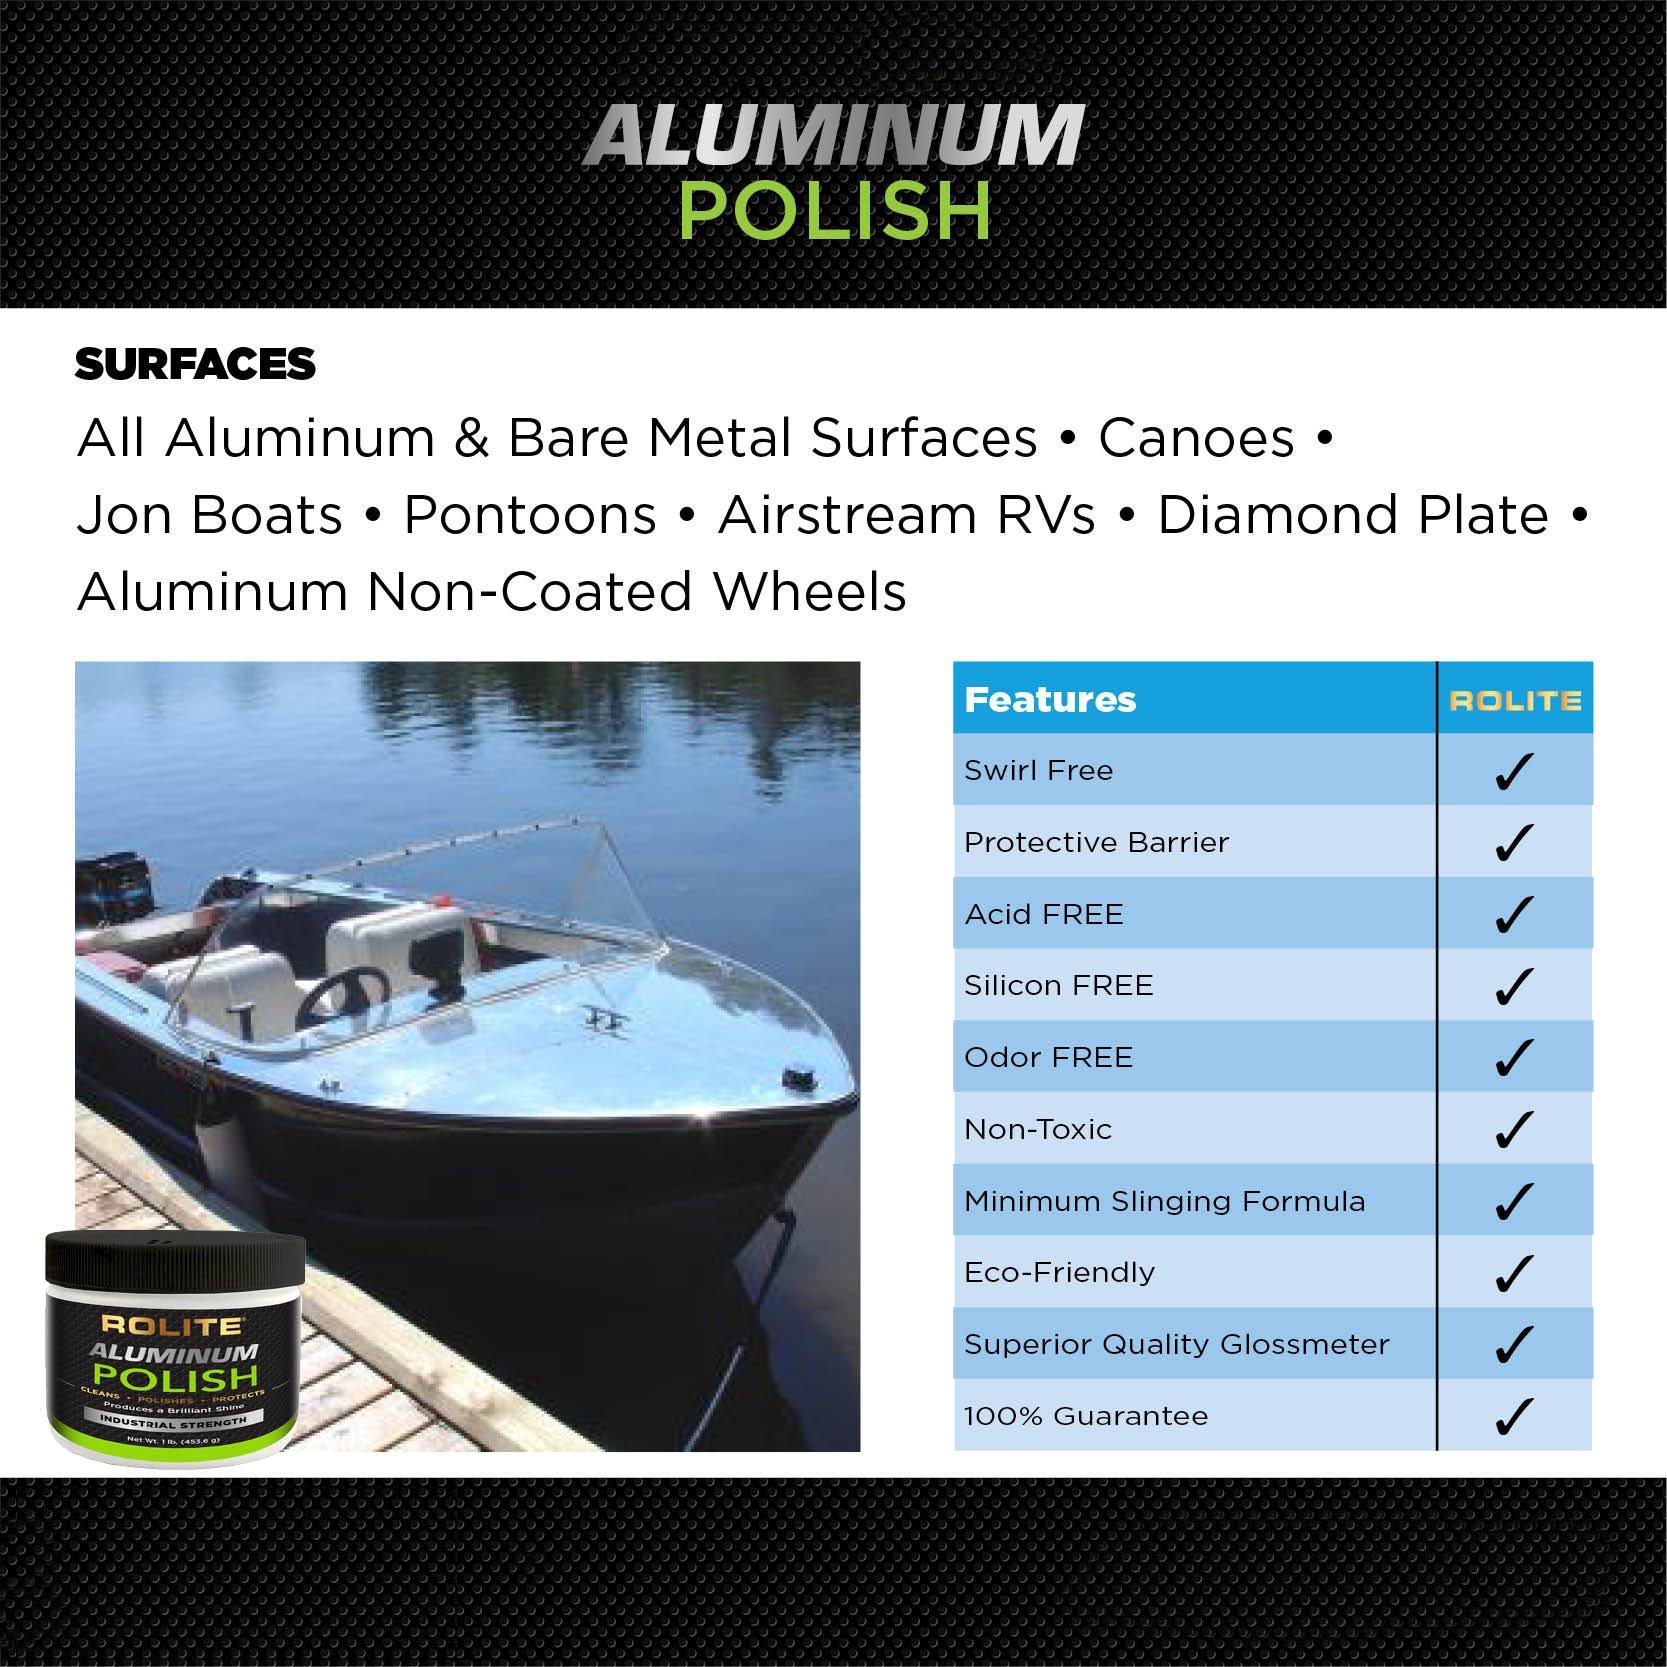 Rolite Aluminum Polish (2lb) for All Aluminum & Bare Metal Surfaces - Canoes, Jon Boats, Pontoons, RVs, Diamond Plate, Aluminum Non-Coated Wheels by Rolite (Image #4)